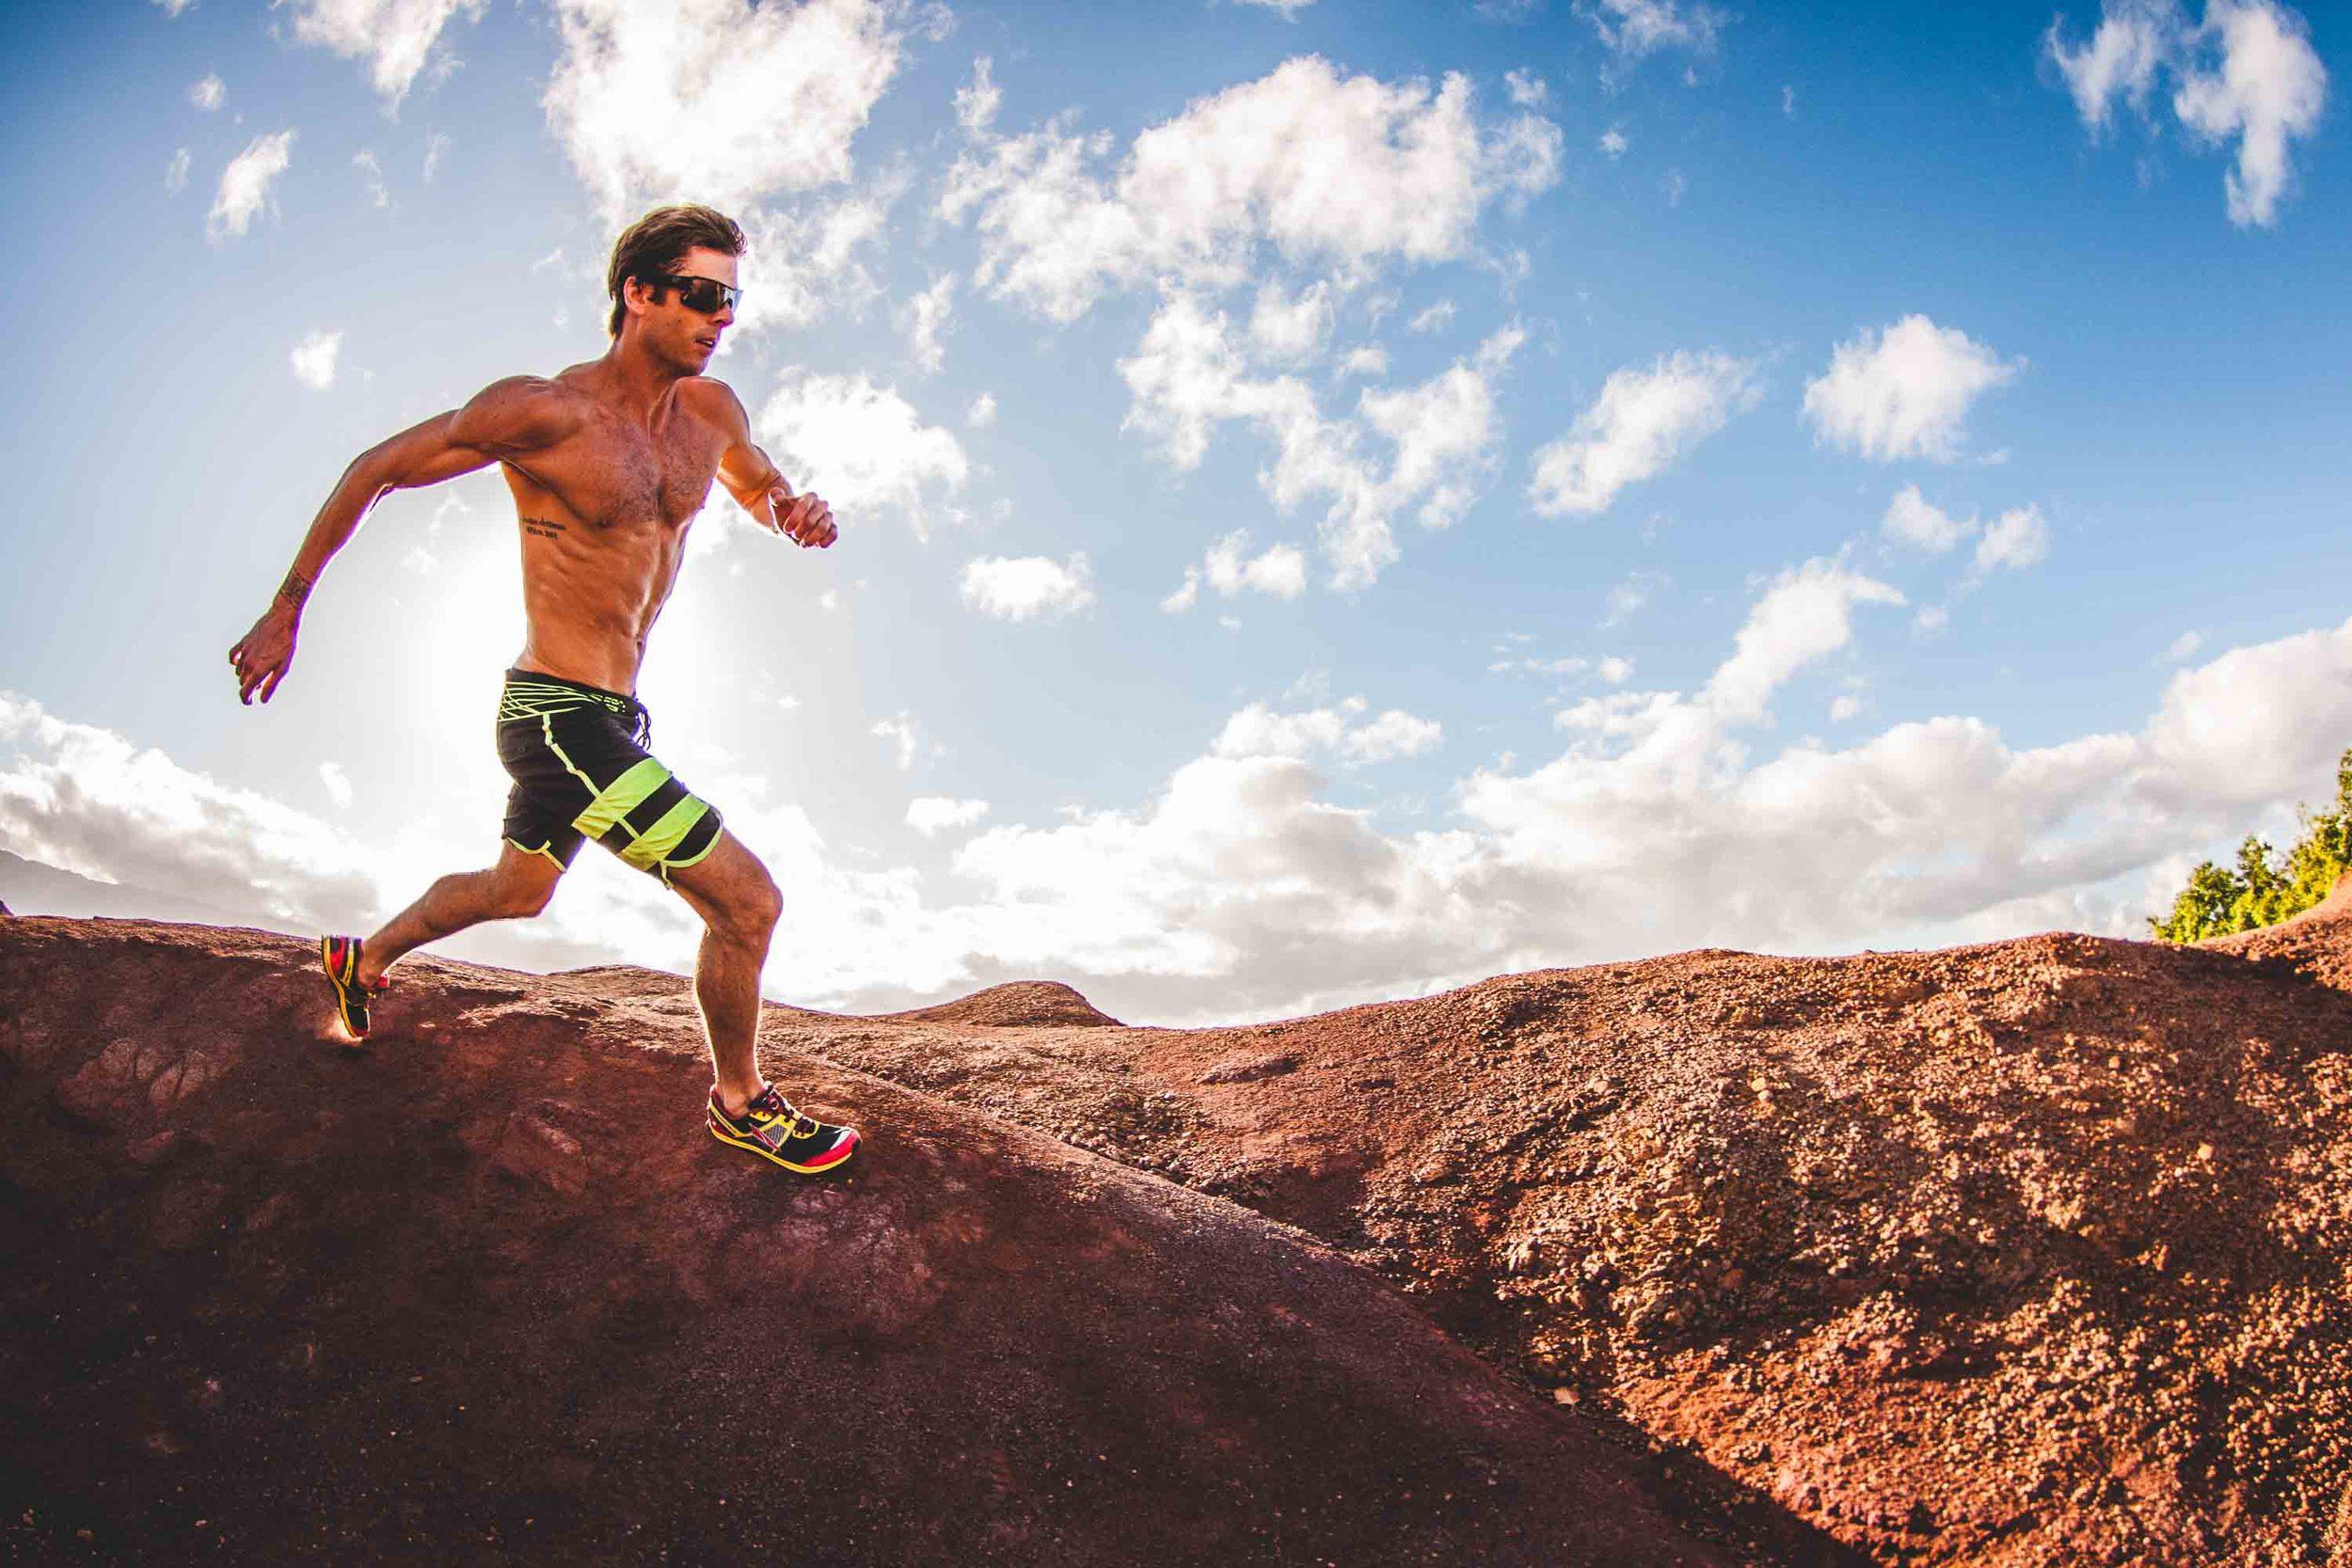 bryce-johnson-Moving Man-running-trails-hawaii-glee-actor-jake pembrook-5.jpg